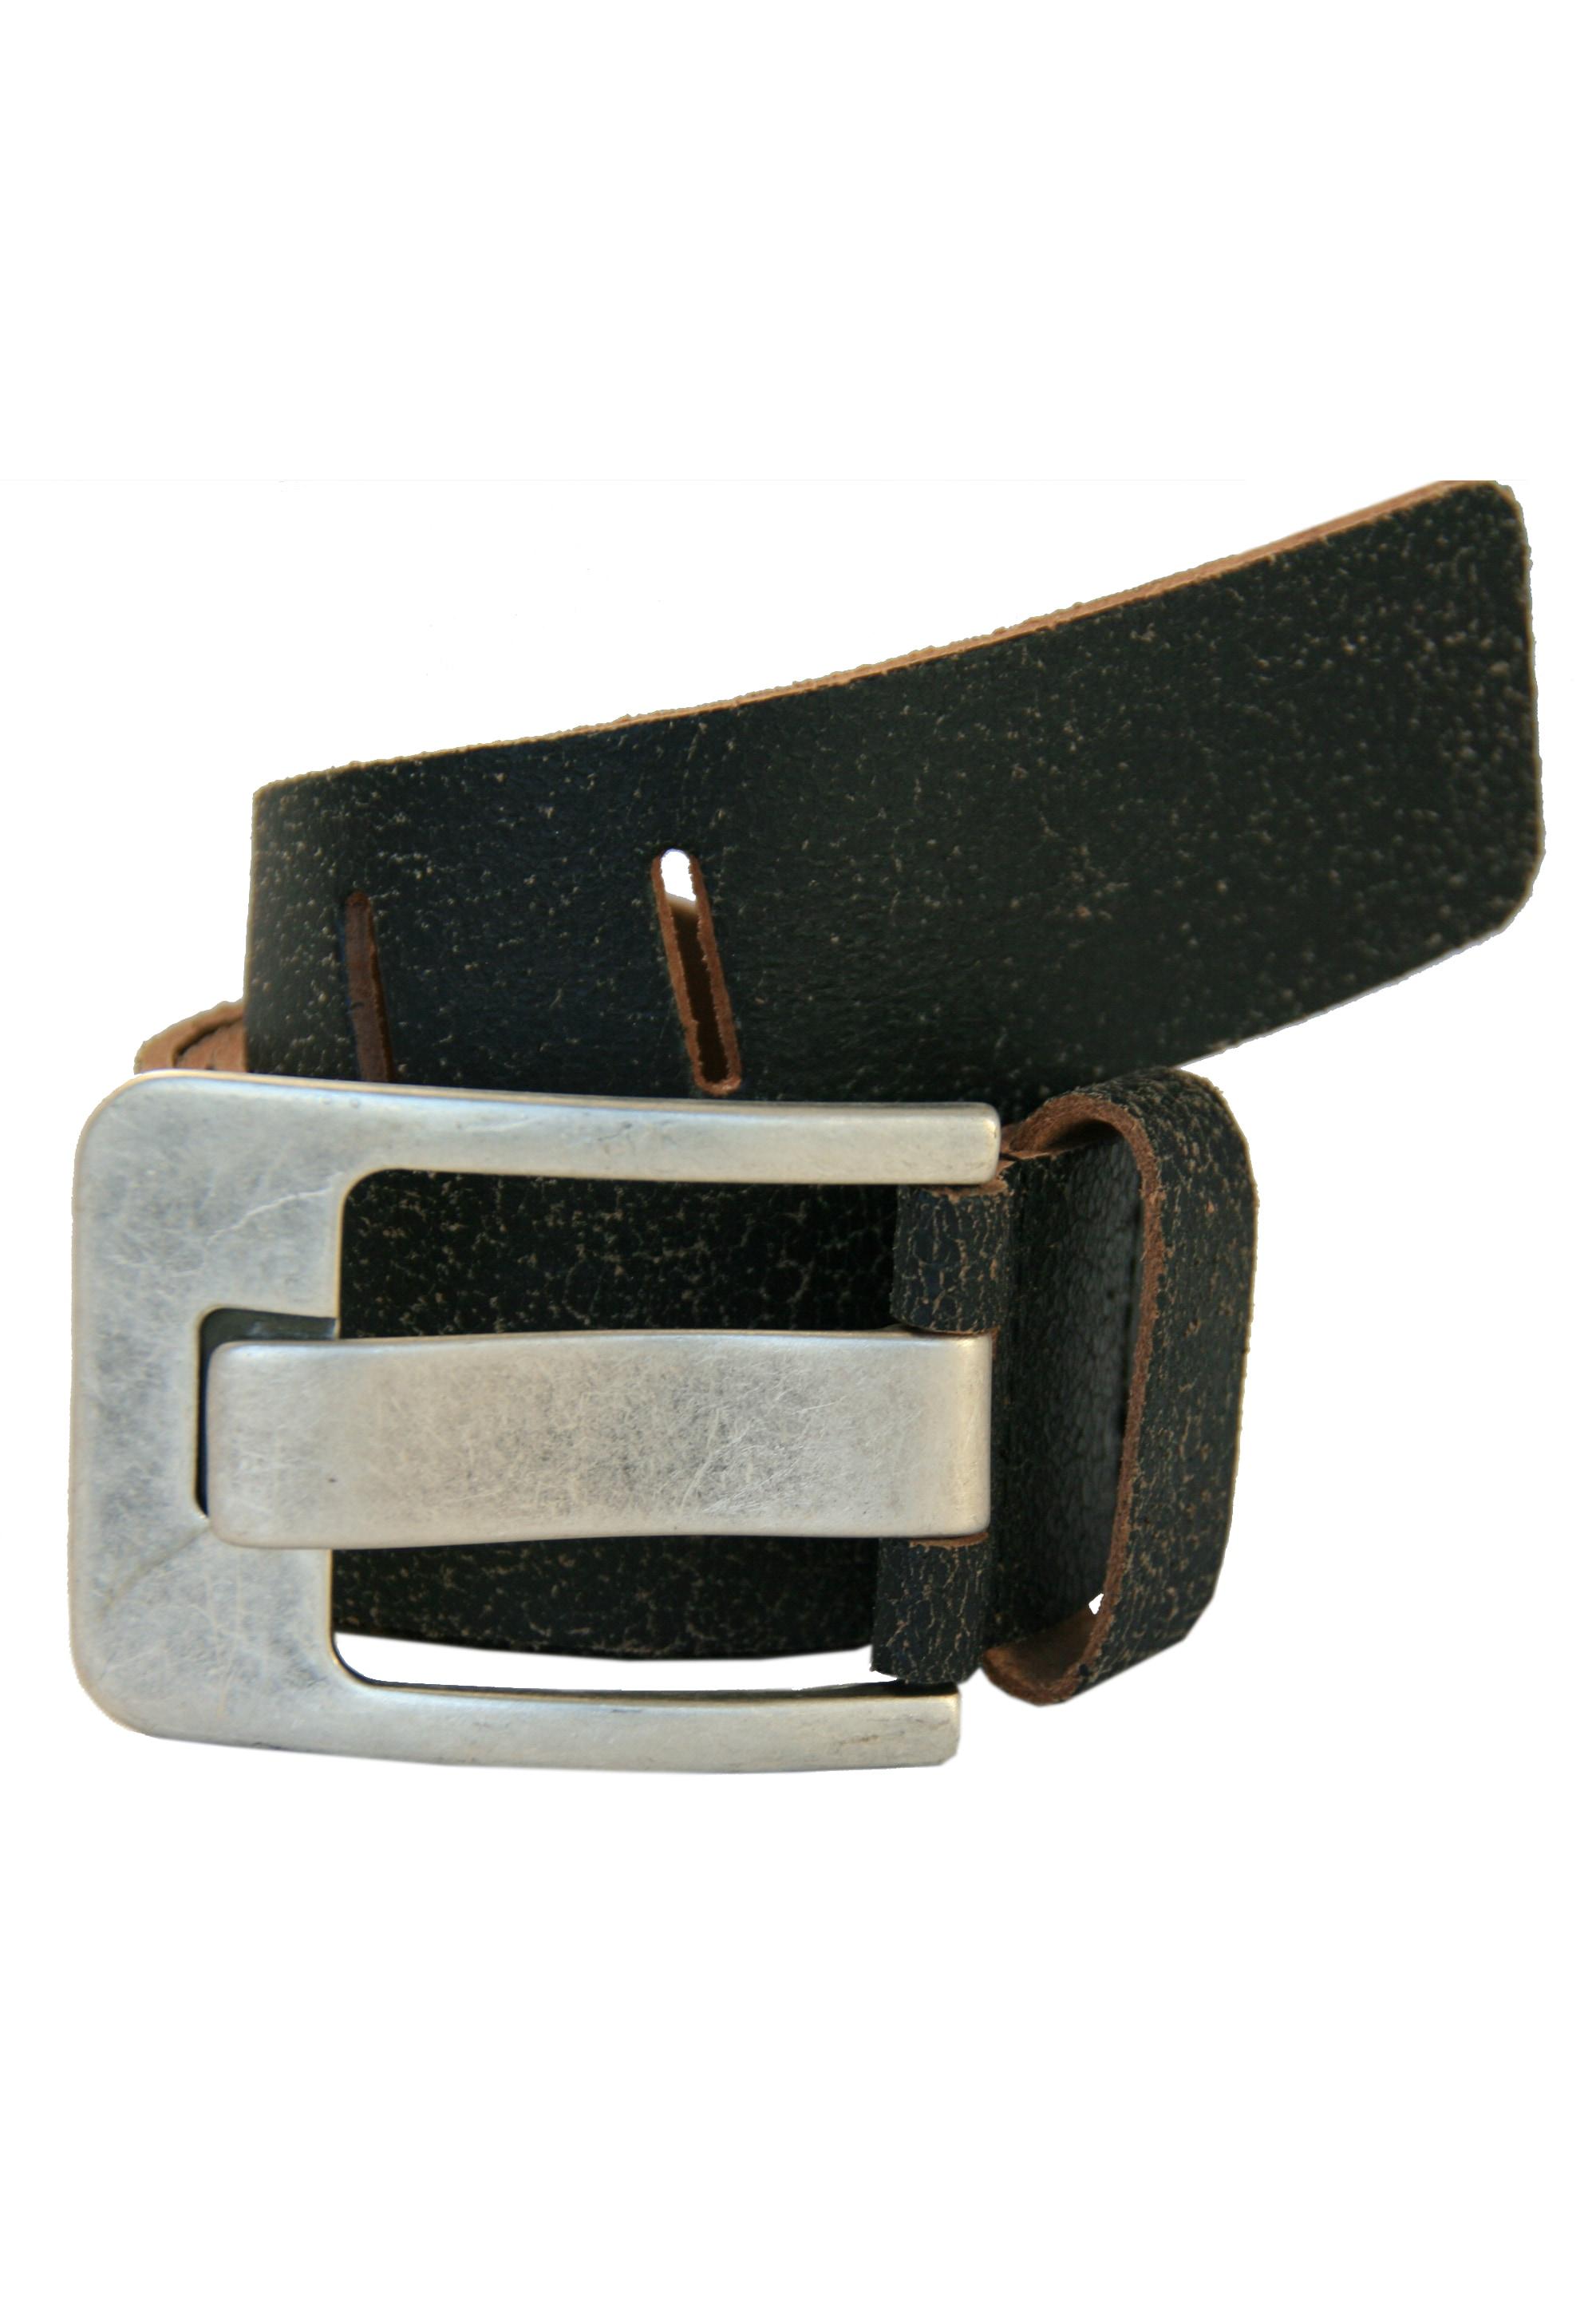 Petrol Industries Ledergürtel, mit hochwertiger Dornschließe schwarz Damen Ledergürtel Gürtel Accessoires 50121_0001_85